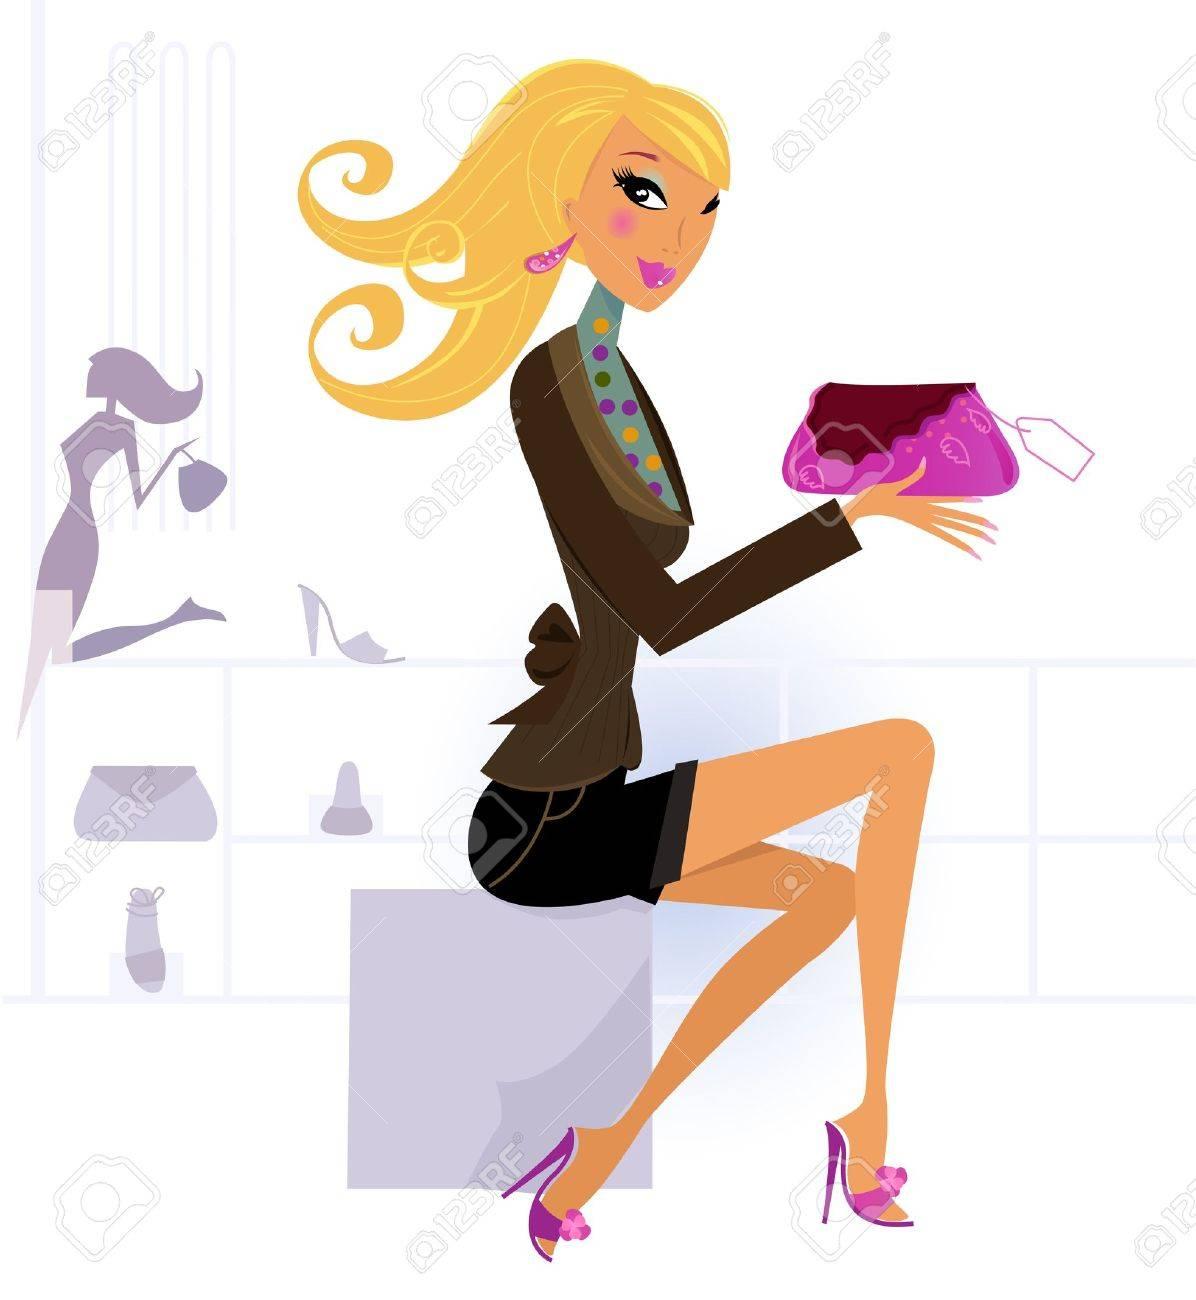 Cute blond girl in shopping center / mall. Vector Illustration. Stock Vector - 9598960